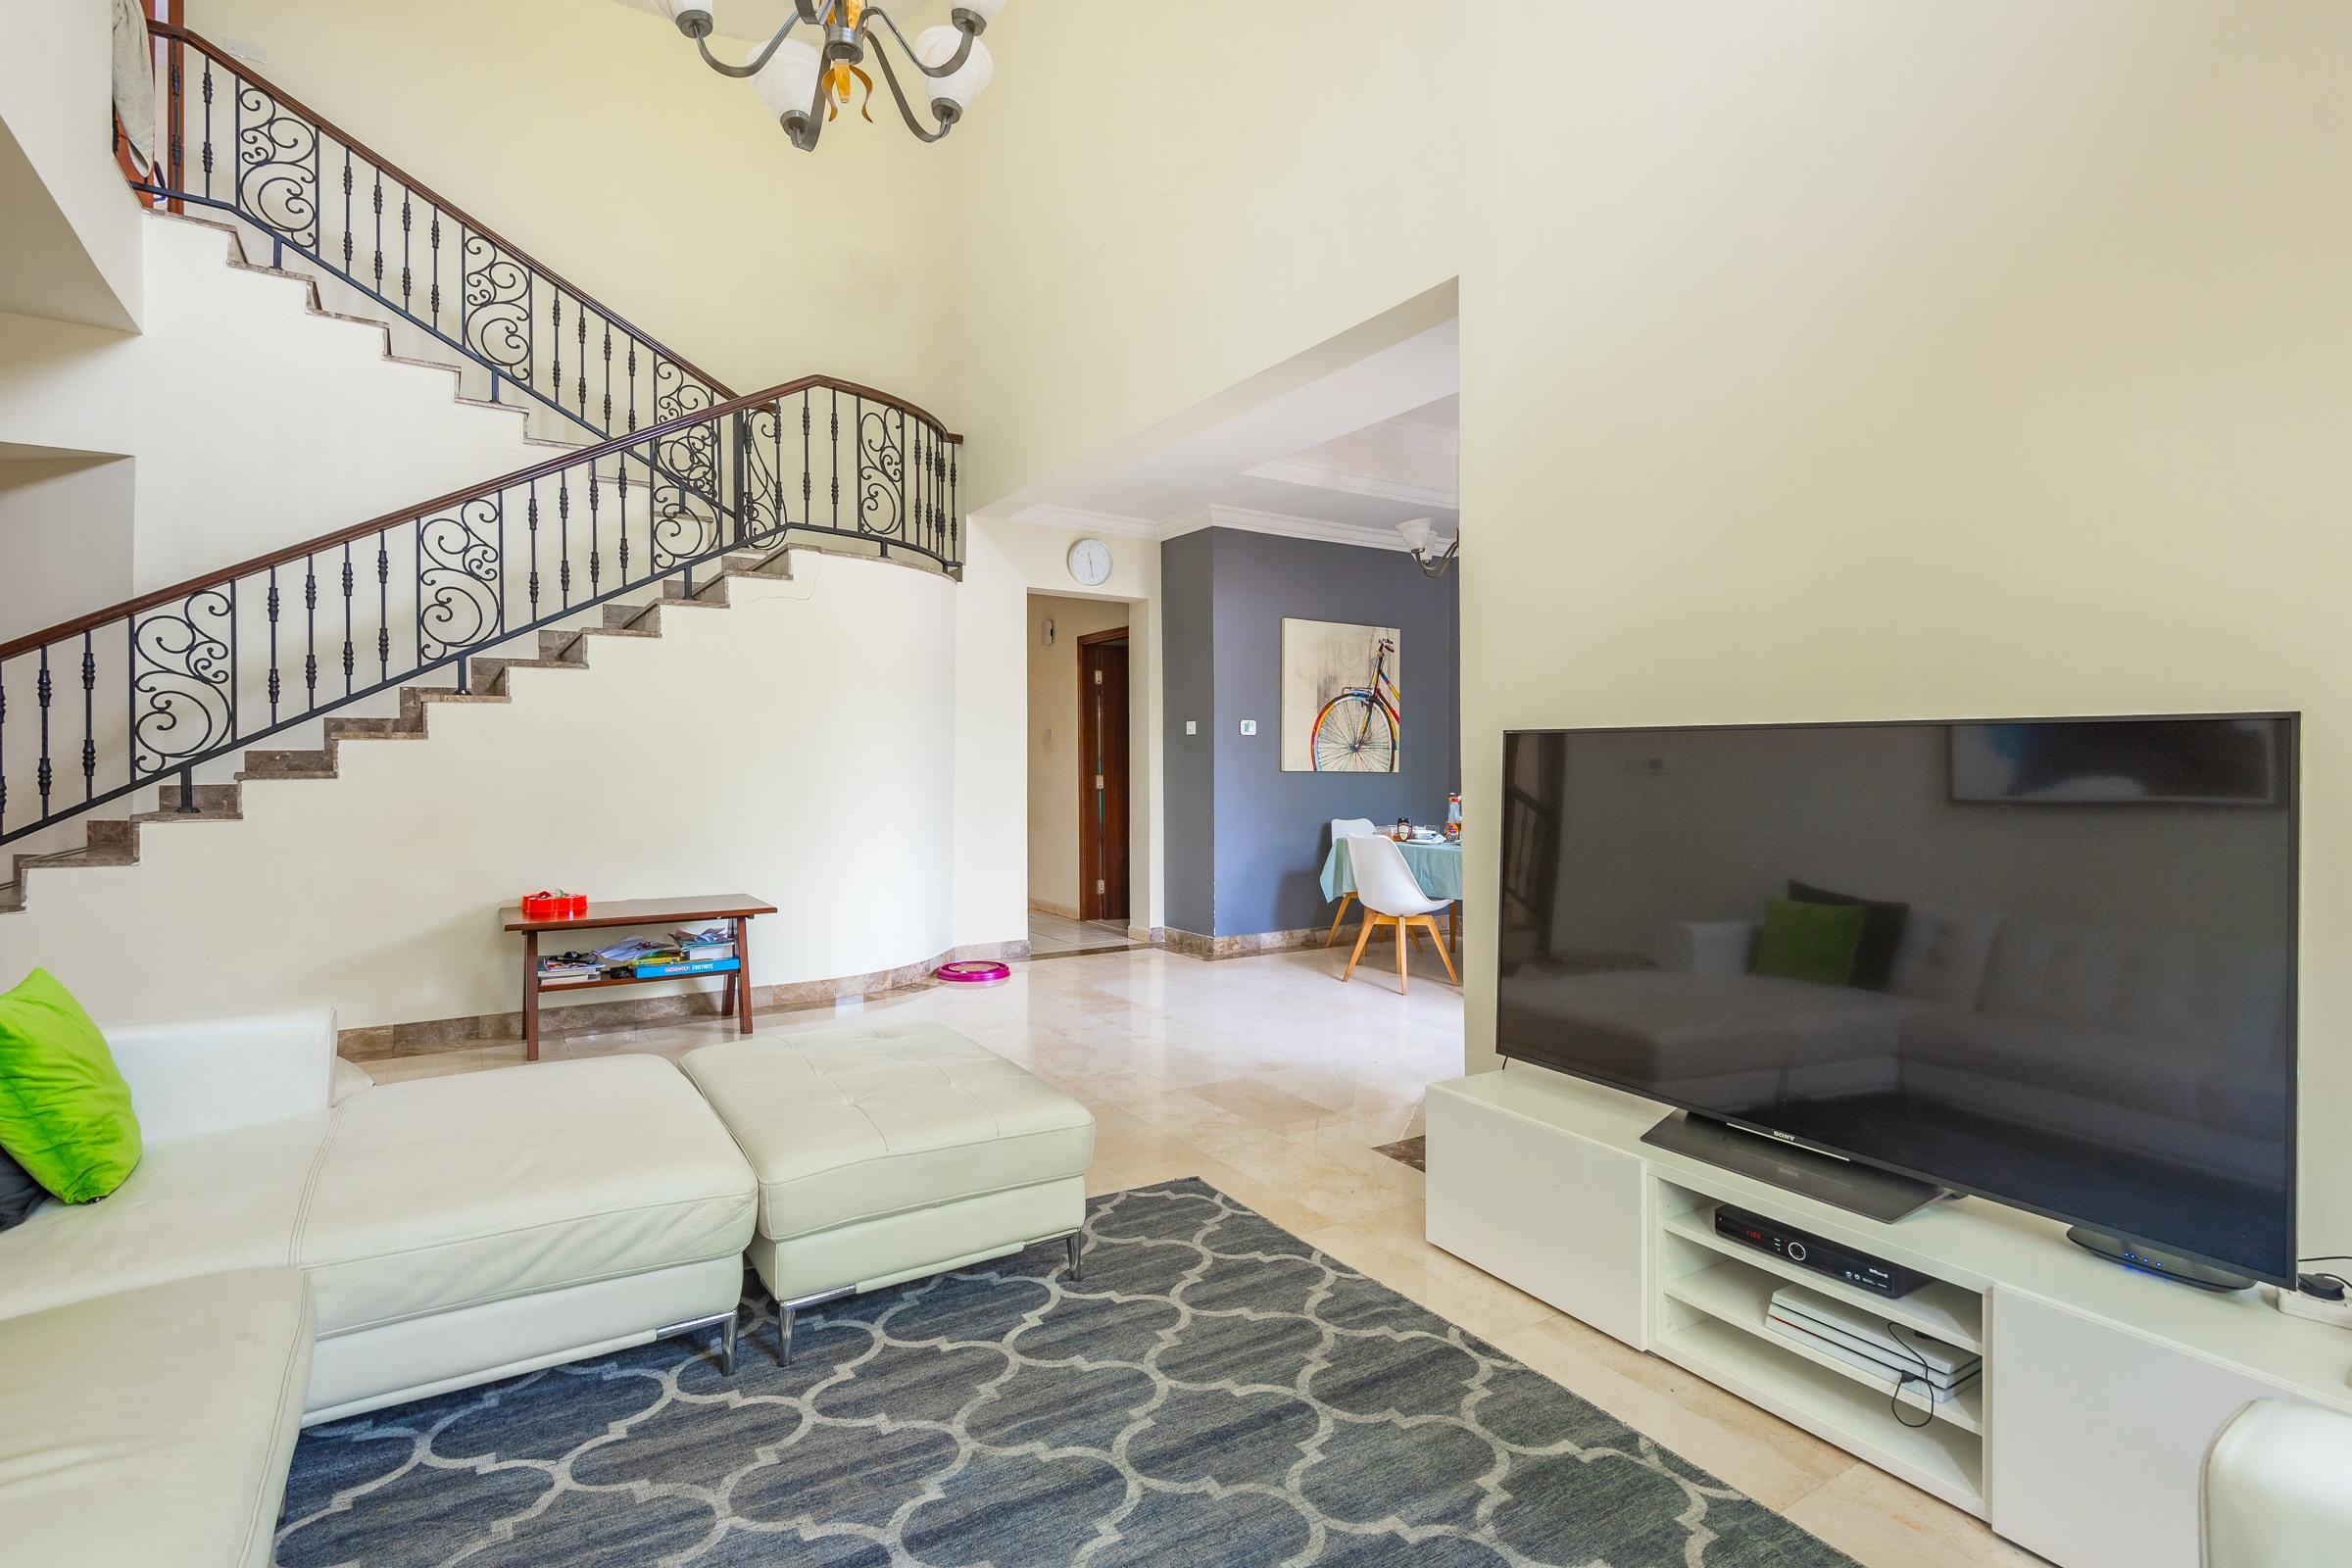 4 Bedroom Entertainment Foyer Greek Isles Villa